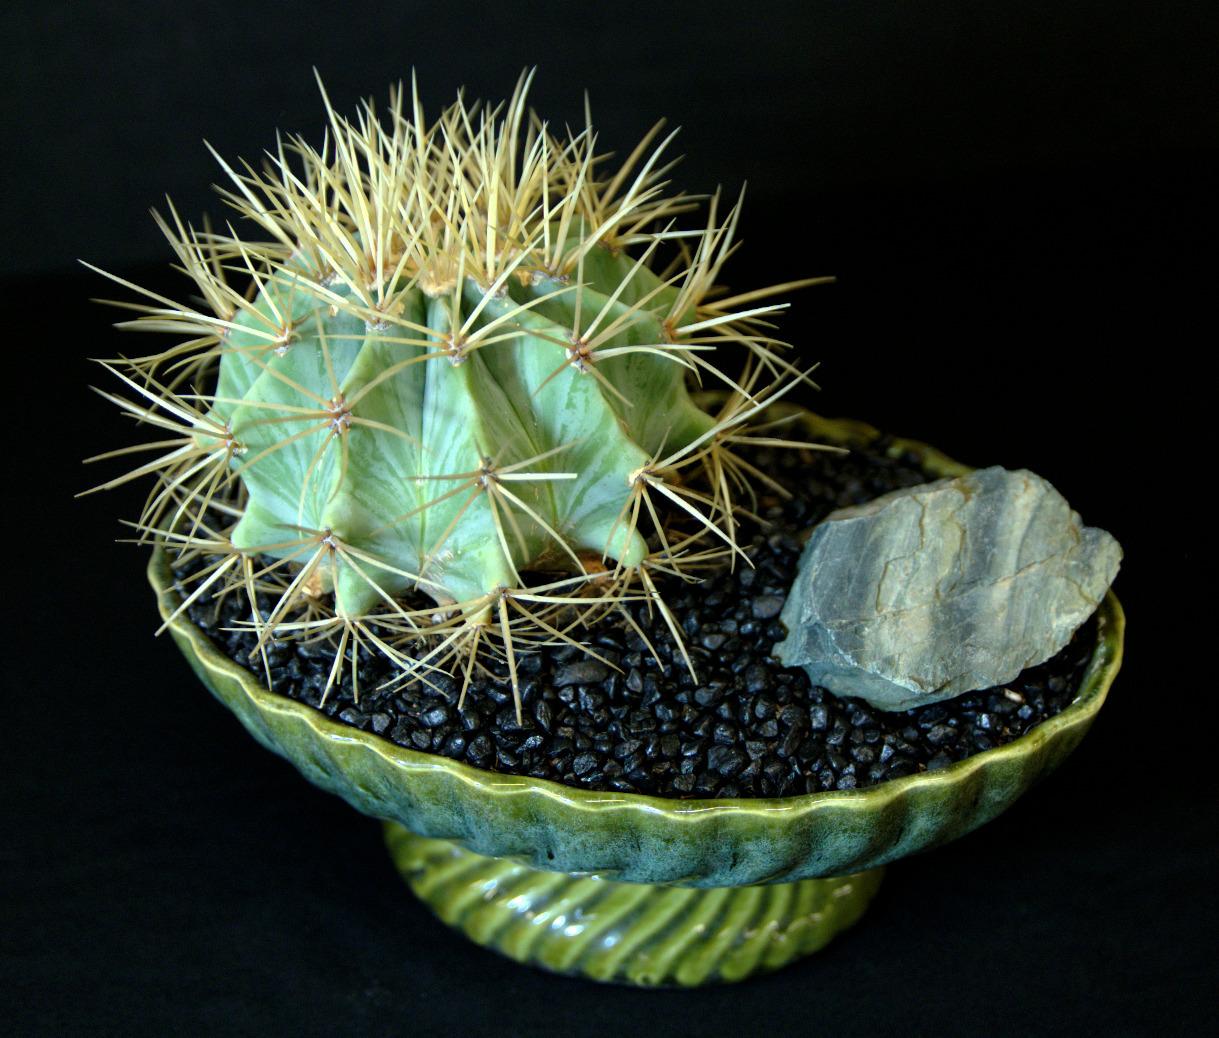 SCCSS 2016 March - Winner Intermediate Cactus - Phyllis DeCrescenzo - Ferocactus pilosus